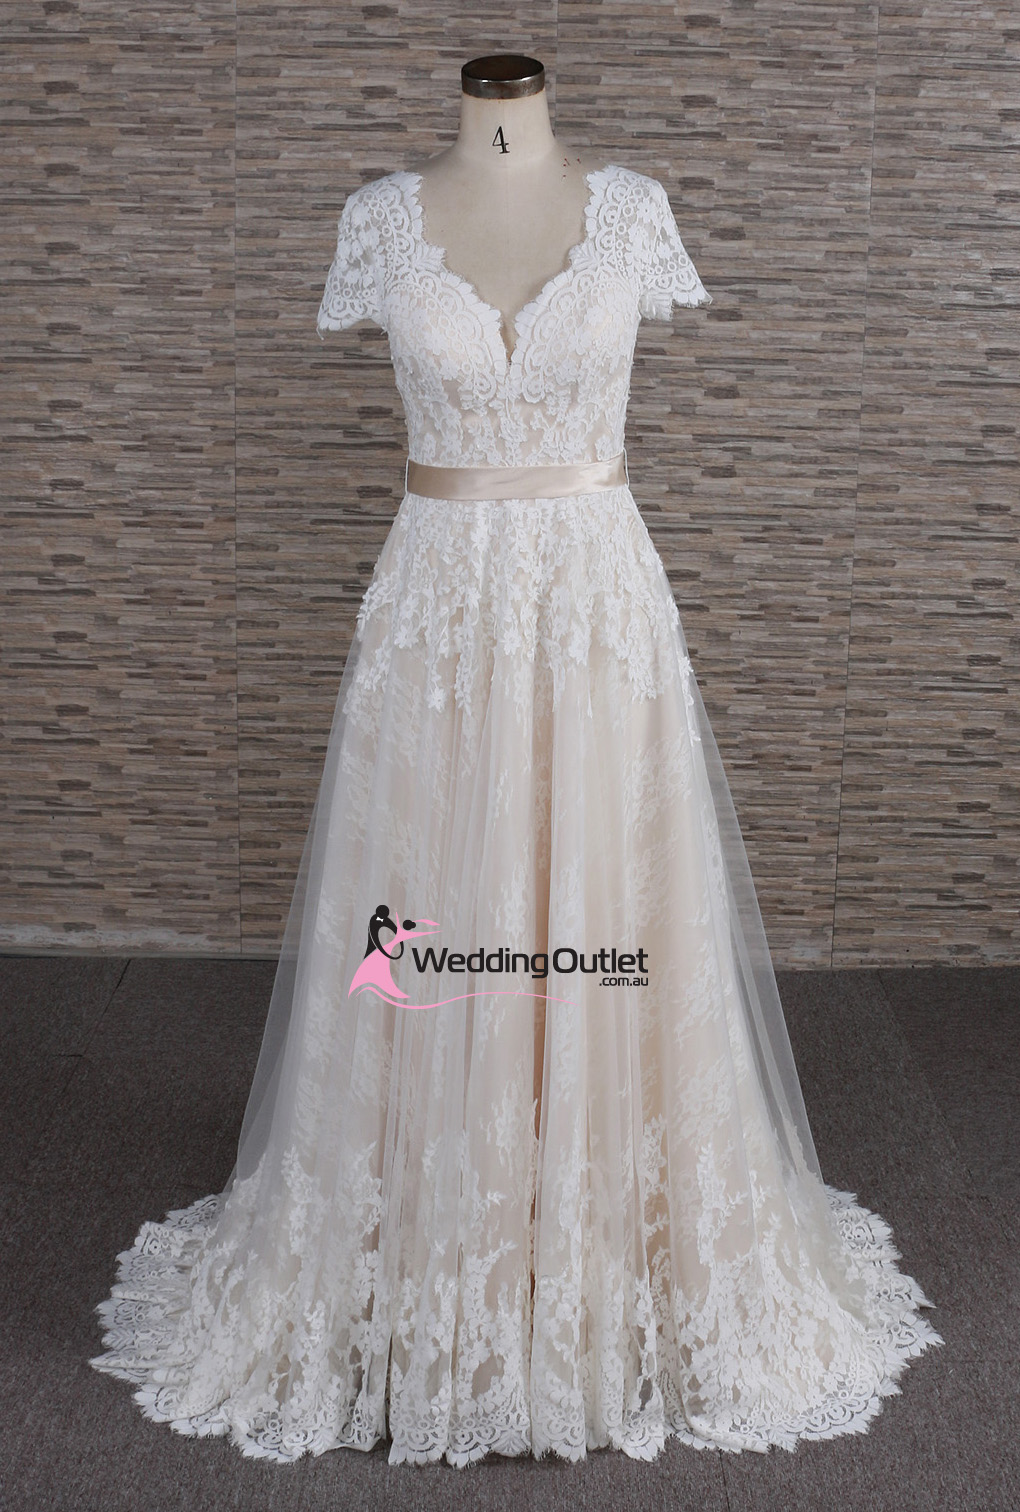 Amalfi Boho Vintage Beach Lace Wedding Dress - WeddingOutlet.com.au